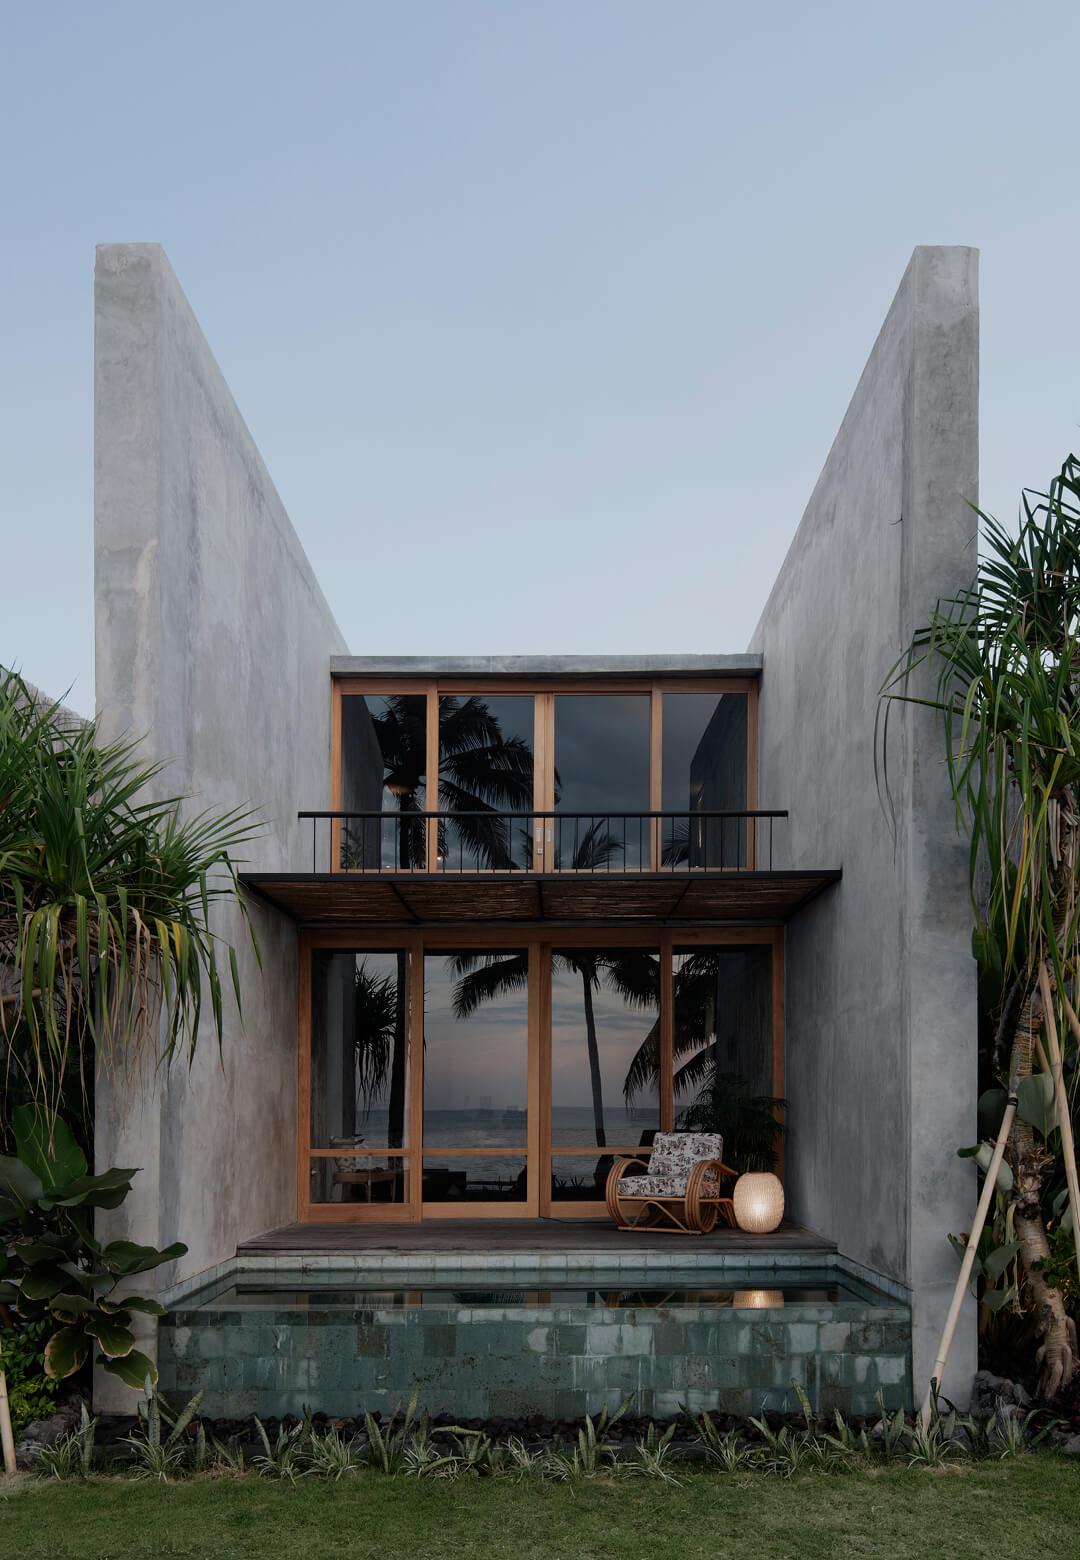 The Tiing, a luxury resort by Nic Brunsdon in Bali, Indonesia | The Tiing hotel | Nic Brunsdon | STIRworld